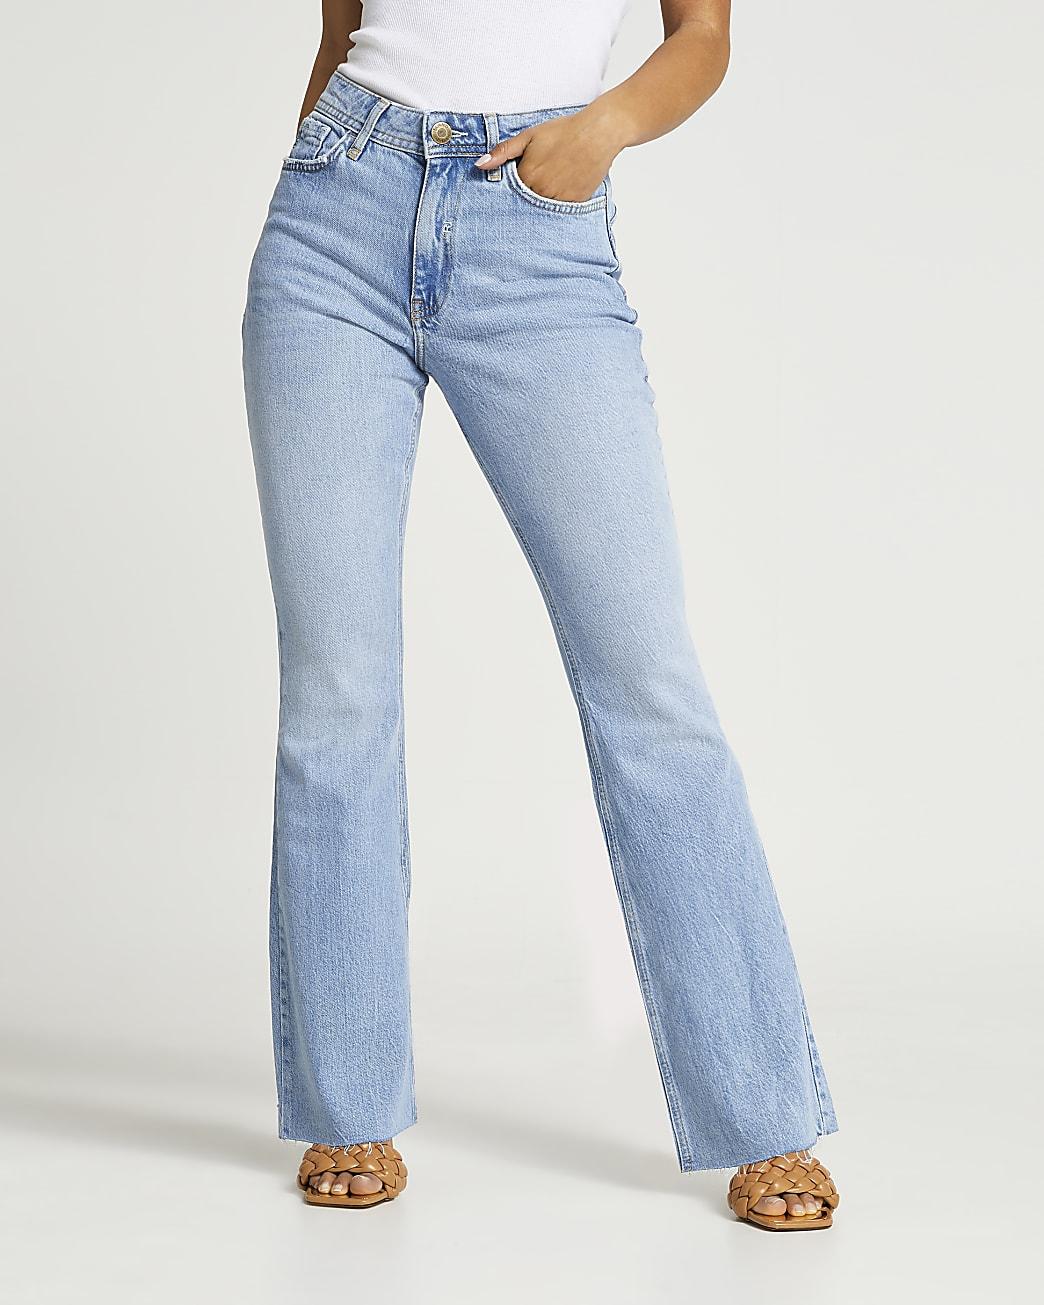 Petite blue bum sculpt flared jeans